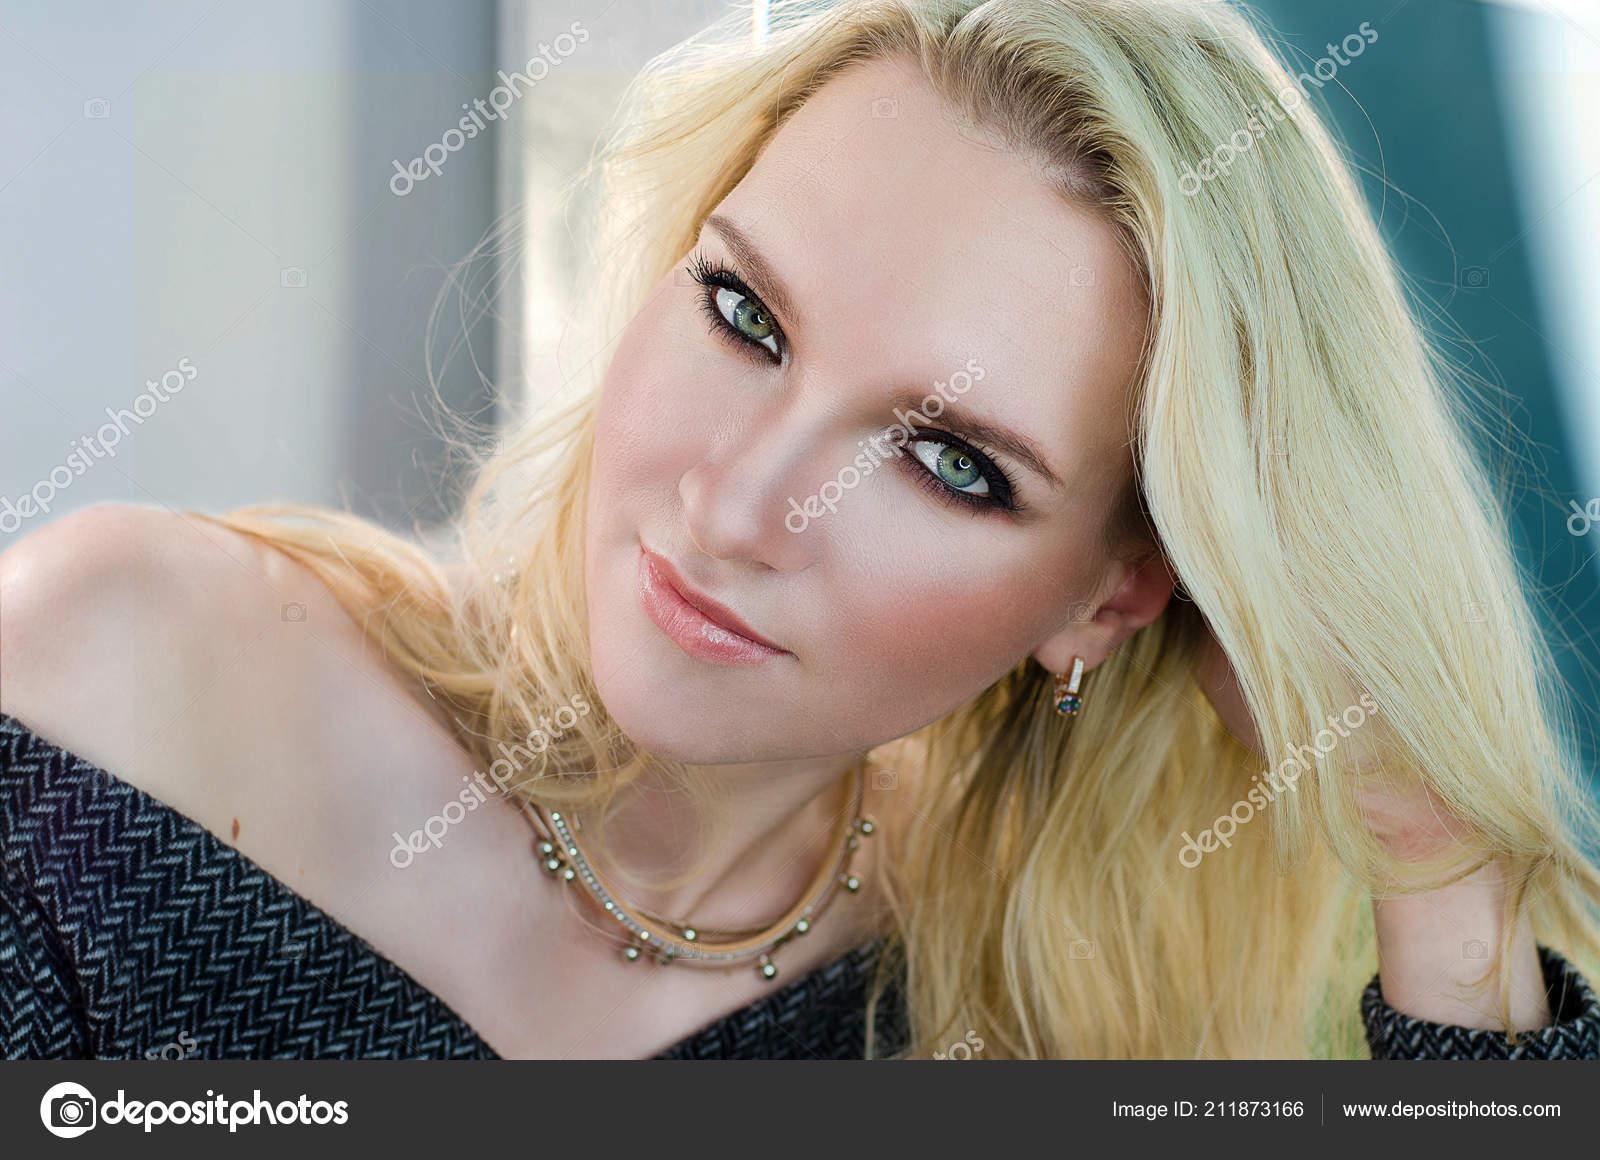 08b00d16bc40 Ένα κορίτσι με μακριά λευκά μαλλιά σε ένα μάλλινο φόρεμα — Εικόνα από ...